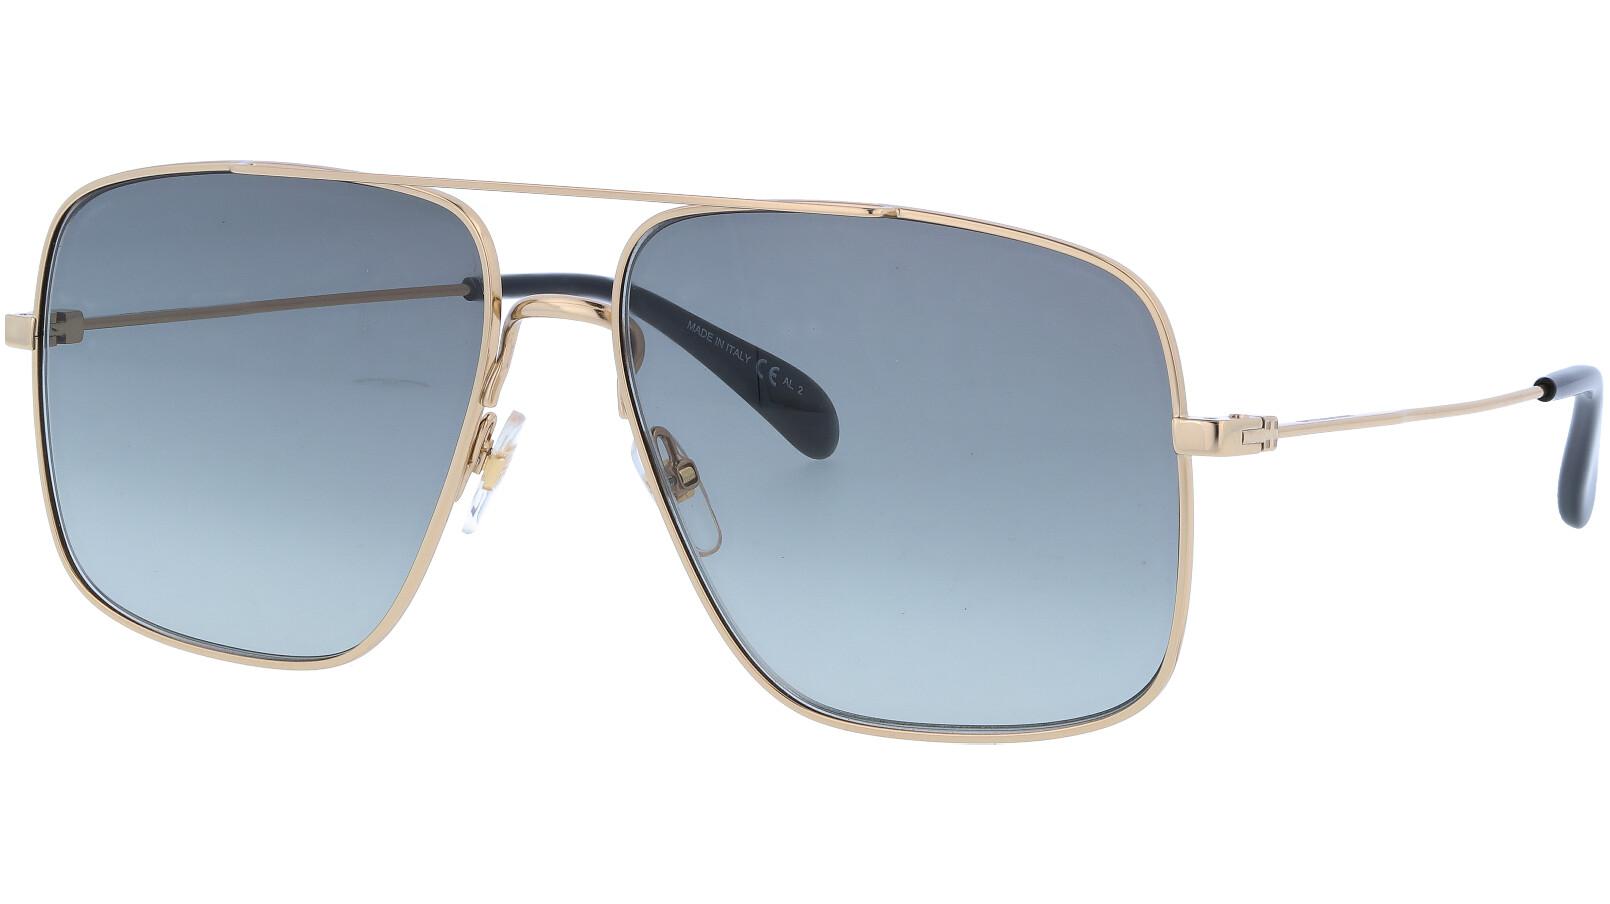 GIVENCHY GV7119S J5GHA 61 GOLD Sunglasses